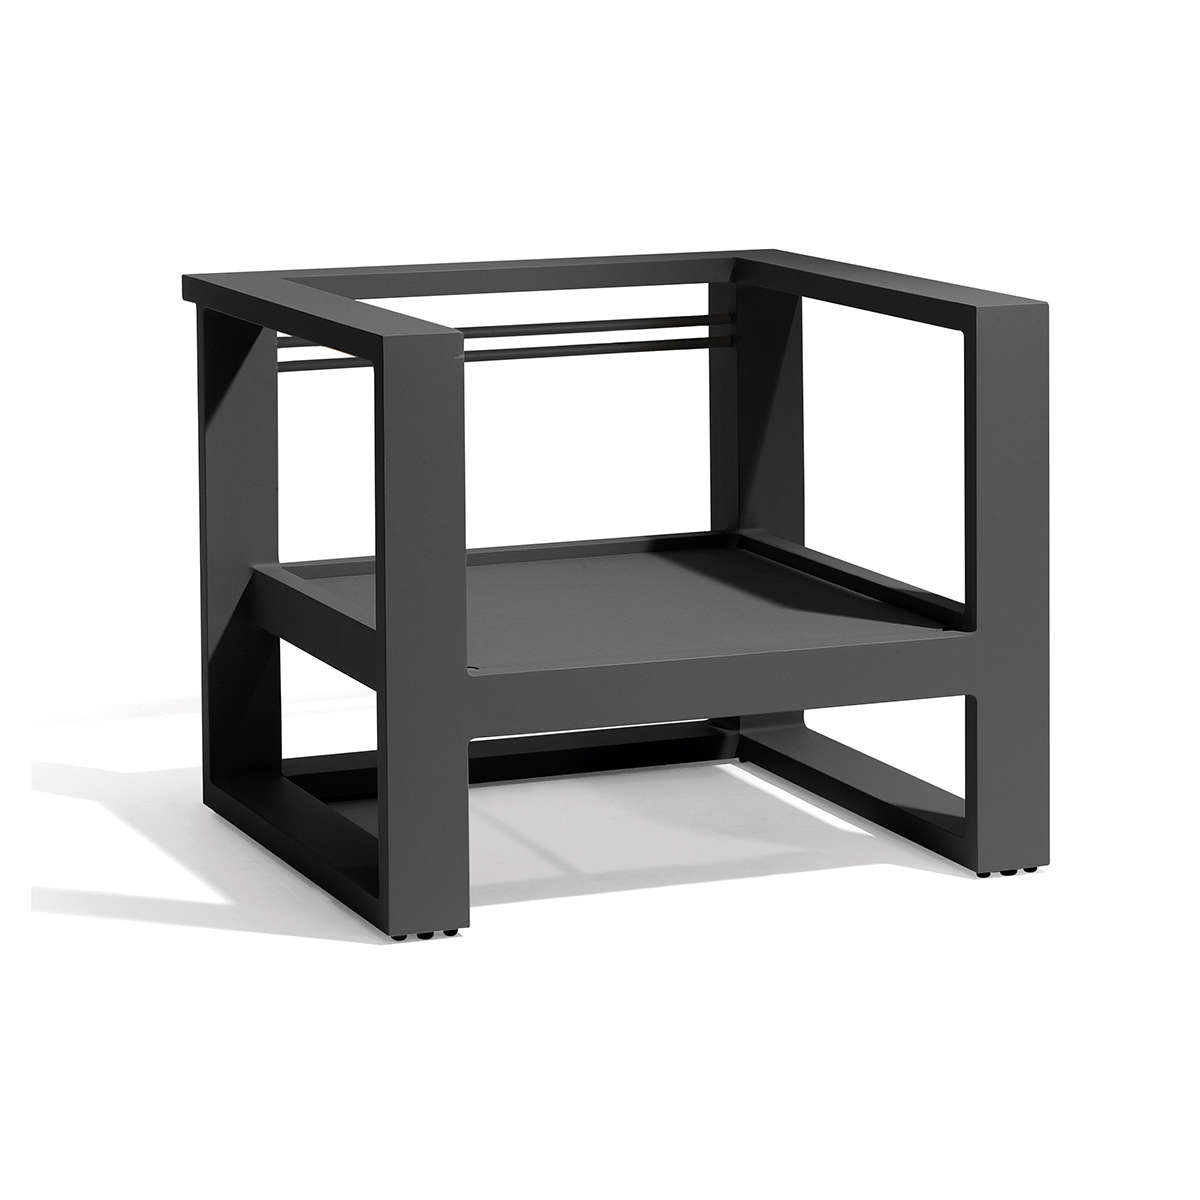 Manutti Fuse Lounge Chair1